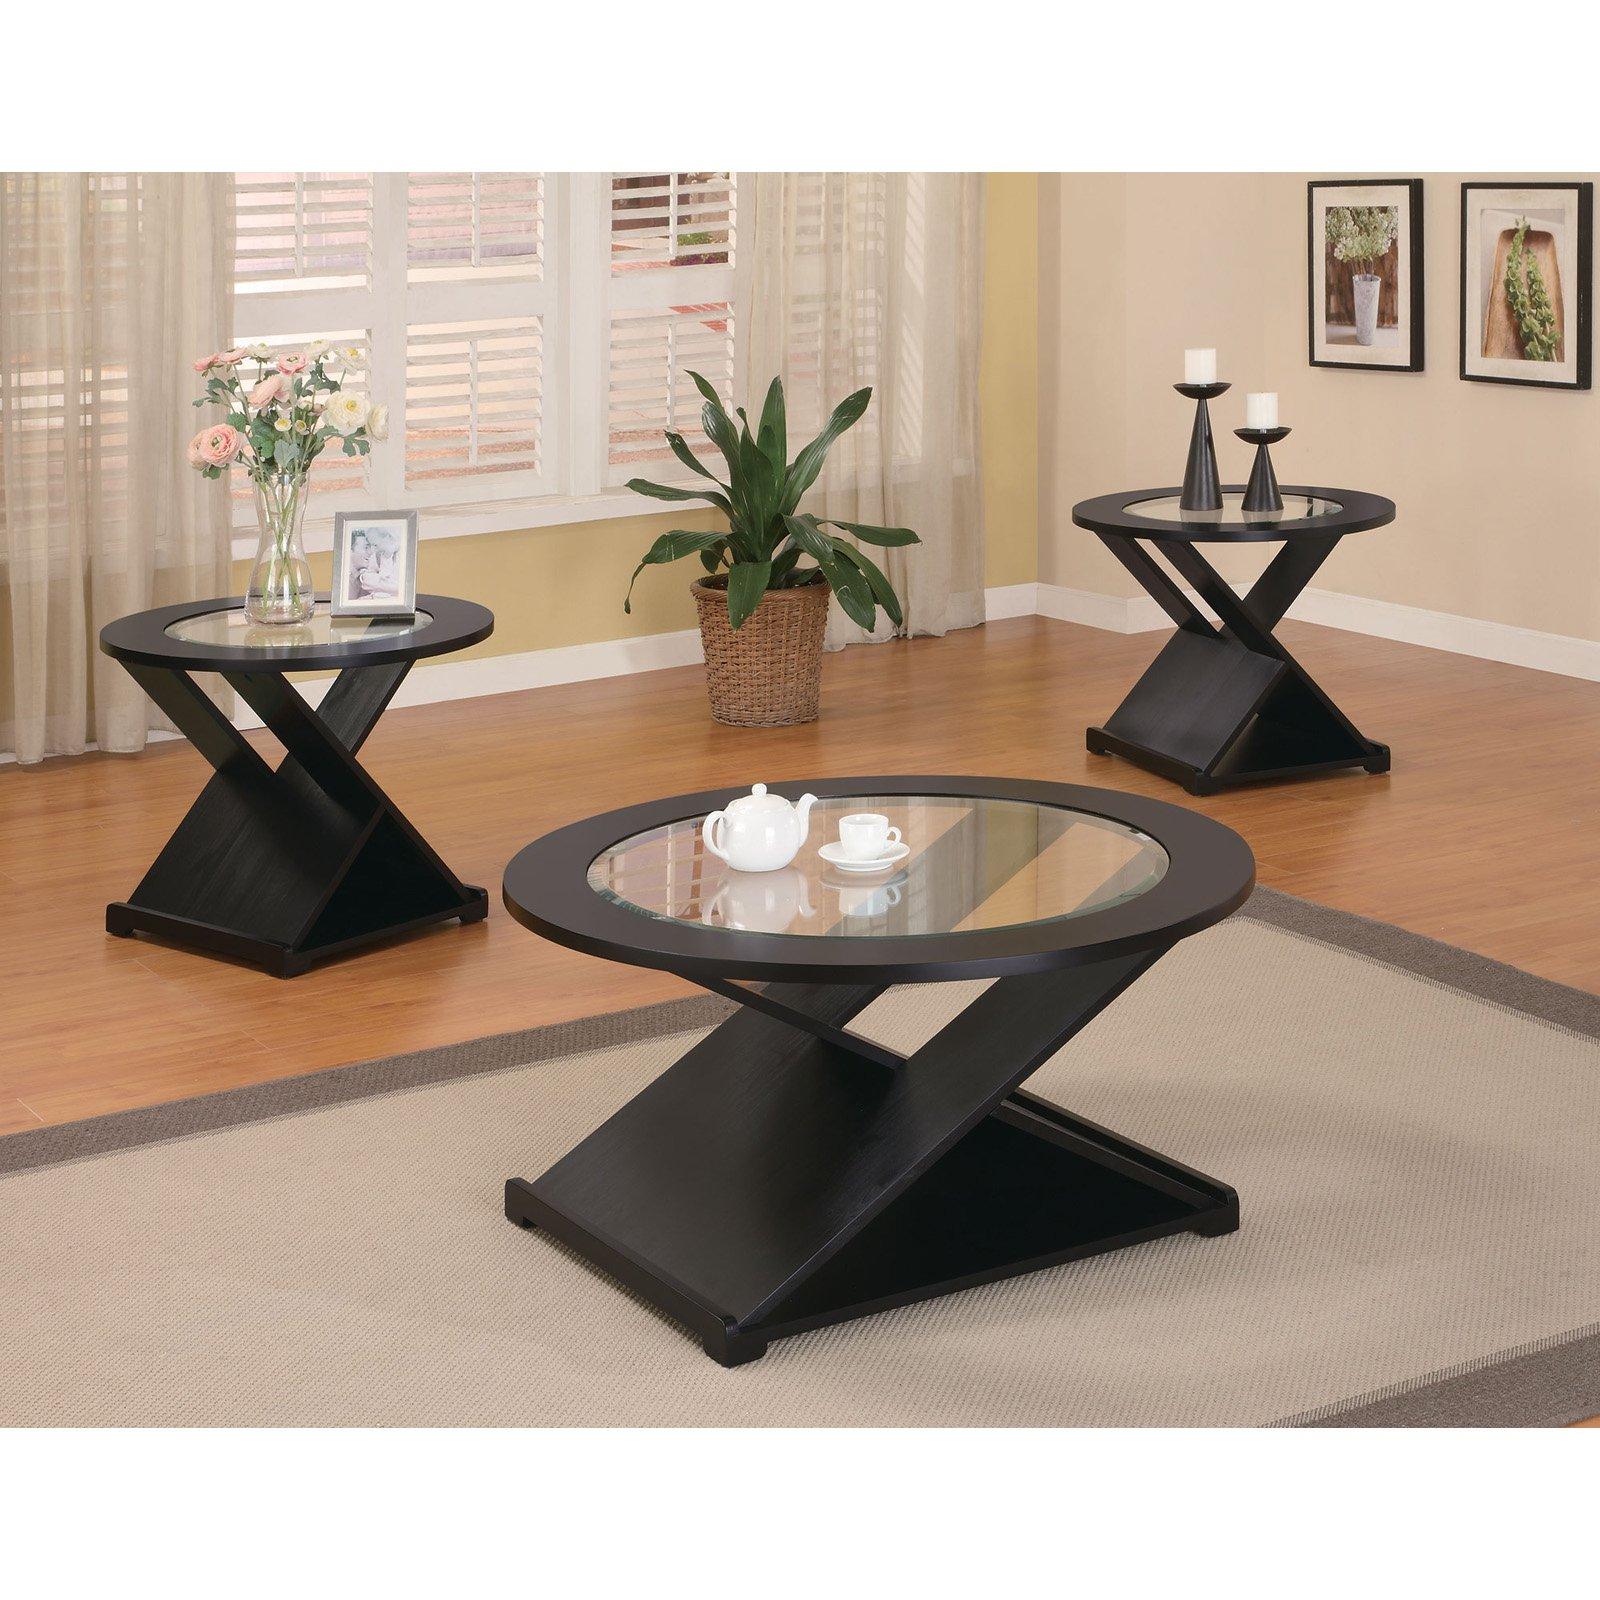 Coaster Furniture 3 Piece X Style Coffee Table Set